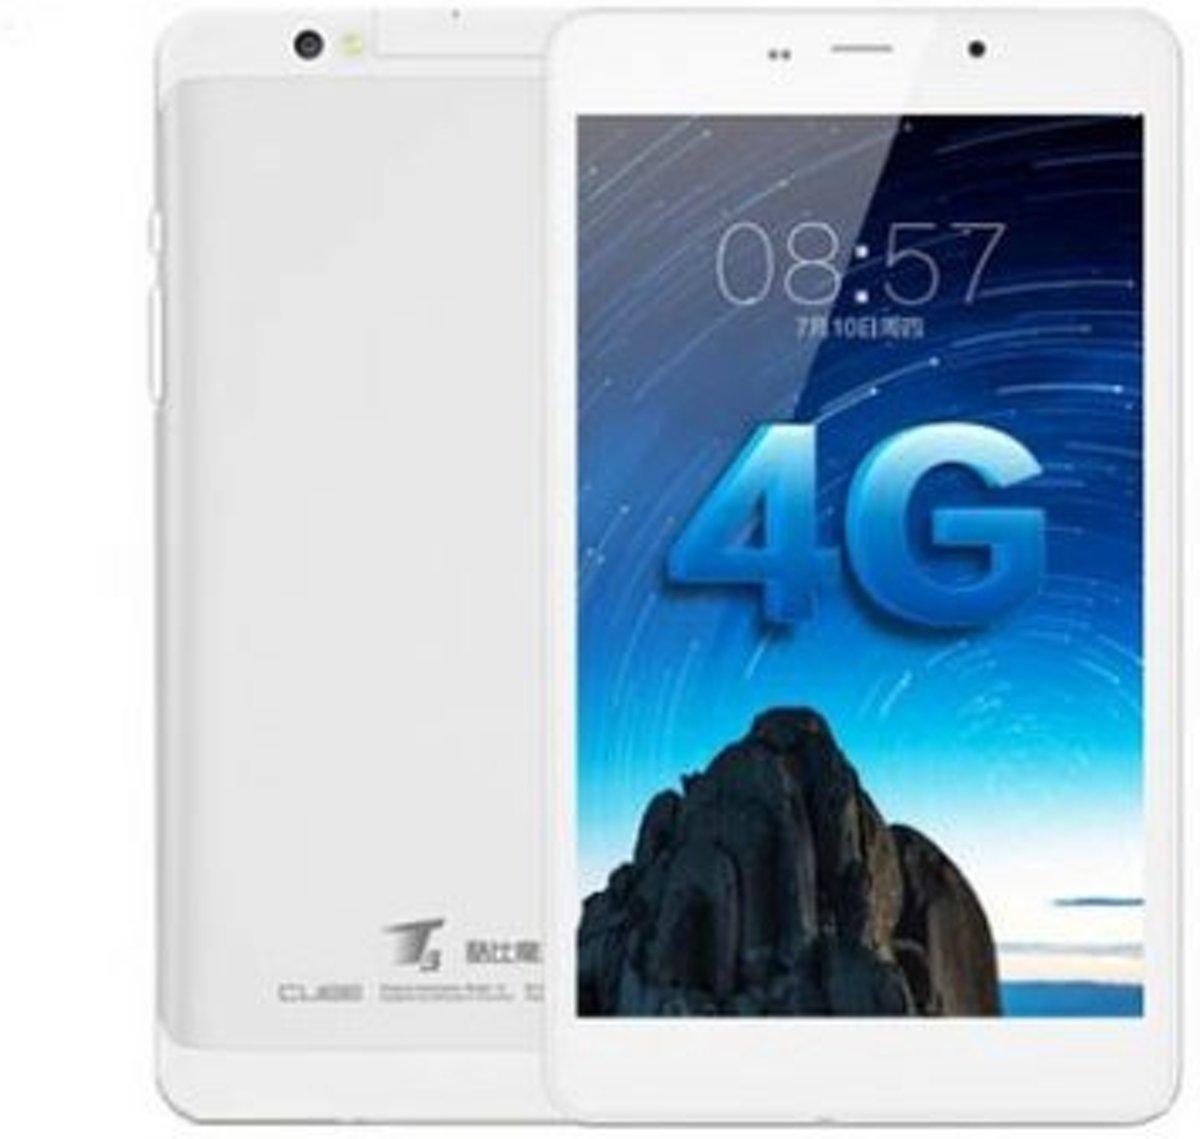 Lipa Dynamic 2/16 GB octacore 4G Phonetablet 10 inch Android 7 GPS + Telefoonfunctie + GPS + Full HD scherm+ Gratis styluspen en oordoppen/ Mogelijkheid mobiel internet